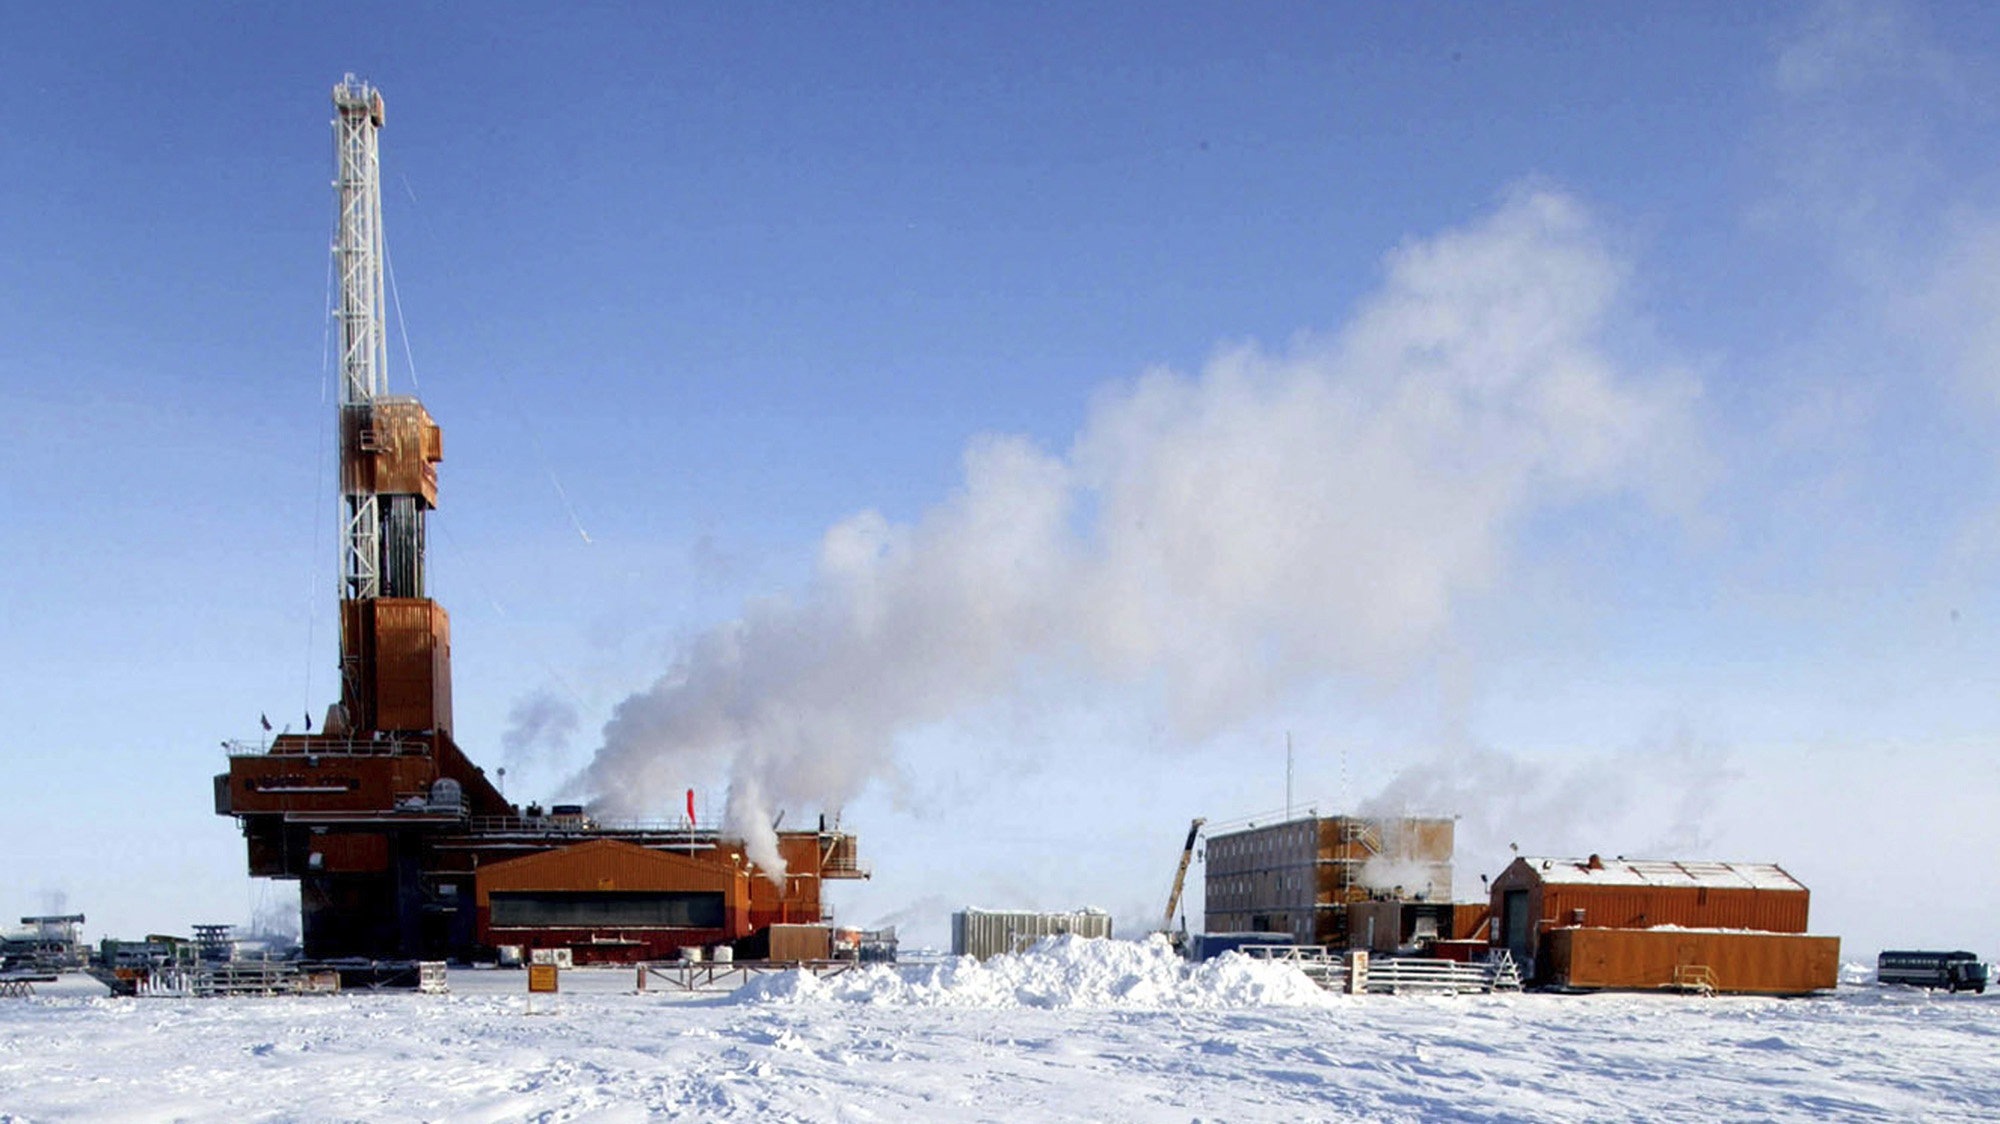 National Petroleum Reserve-Alaska